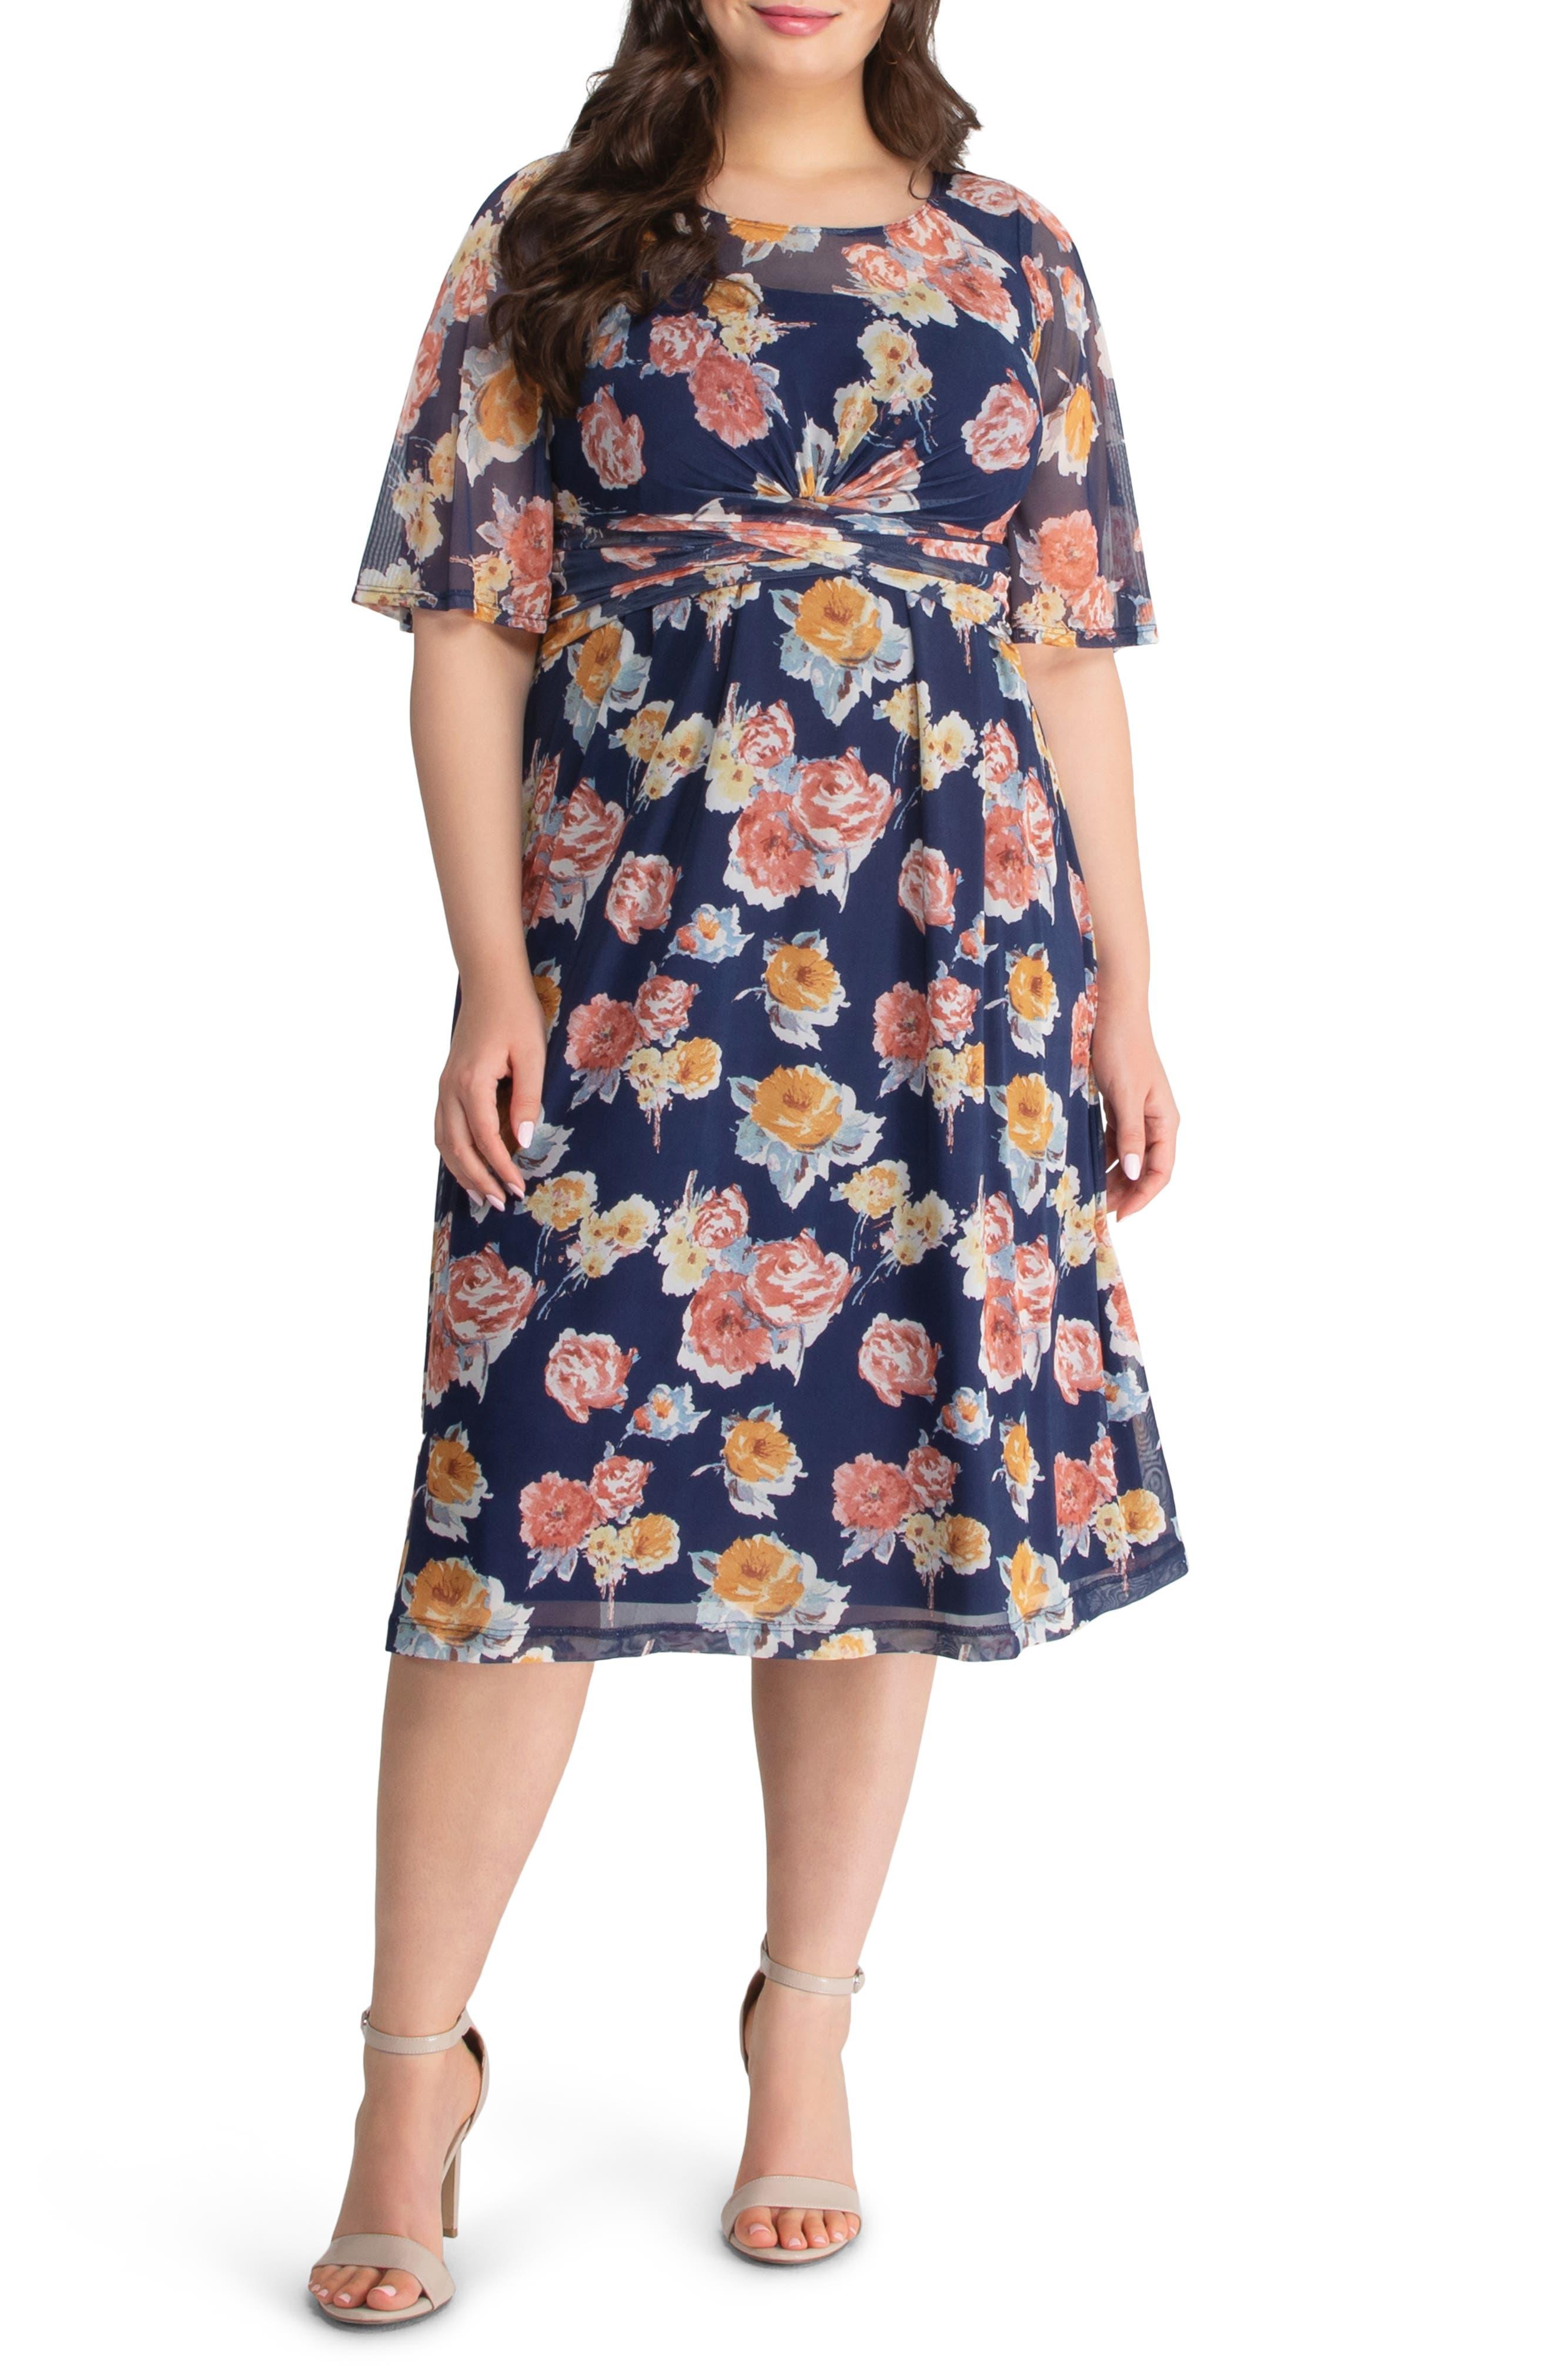 Katarina Floral Party Dress